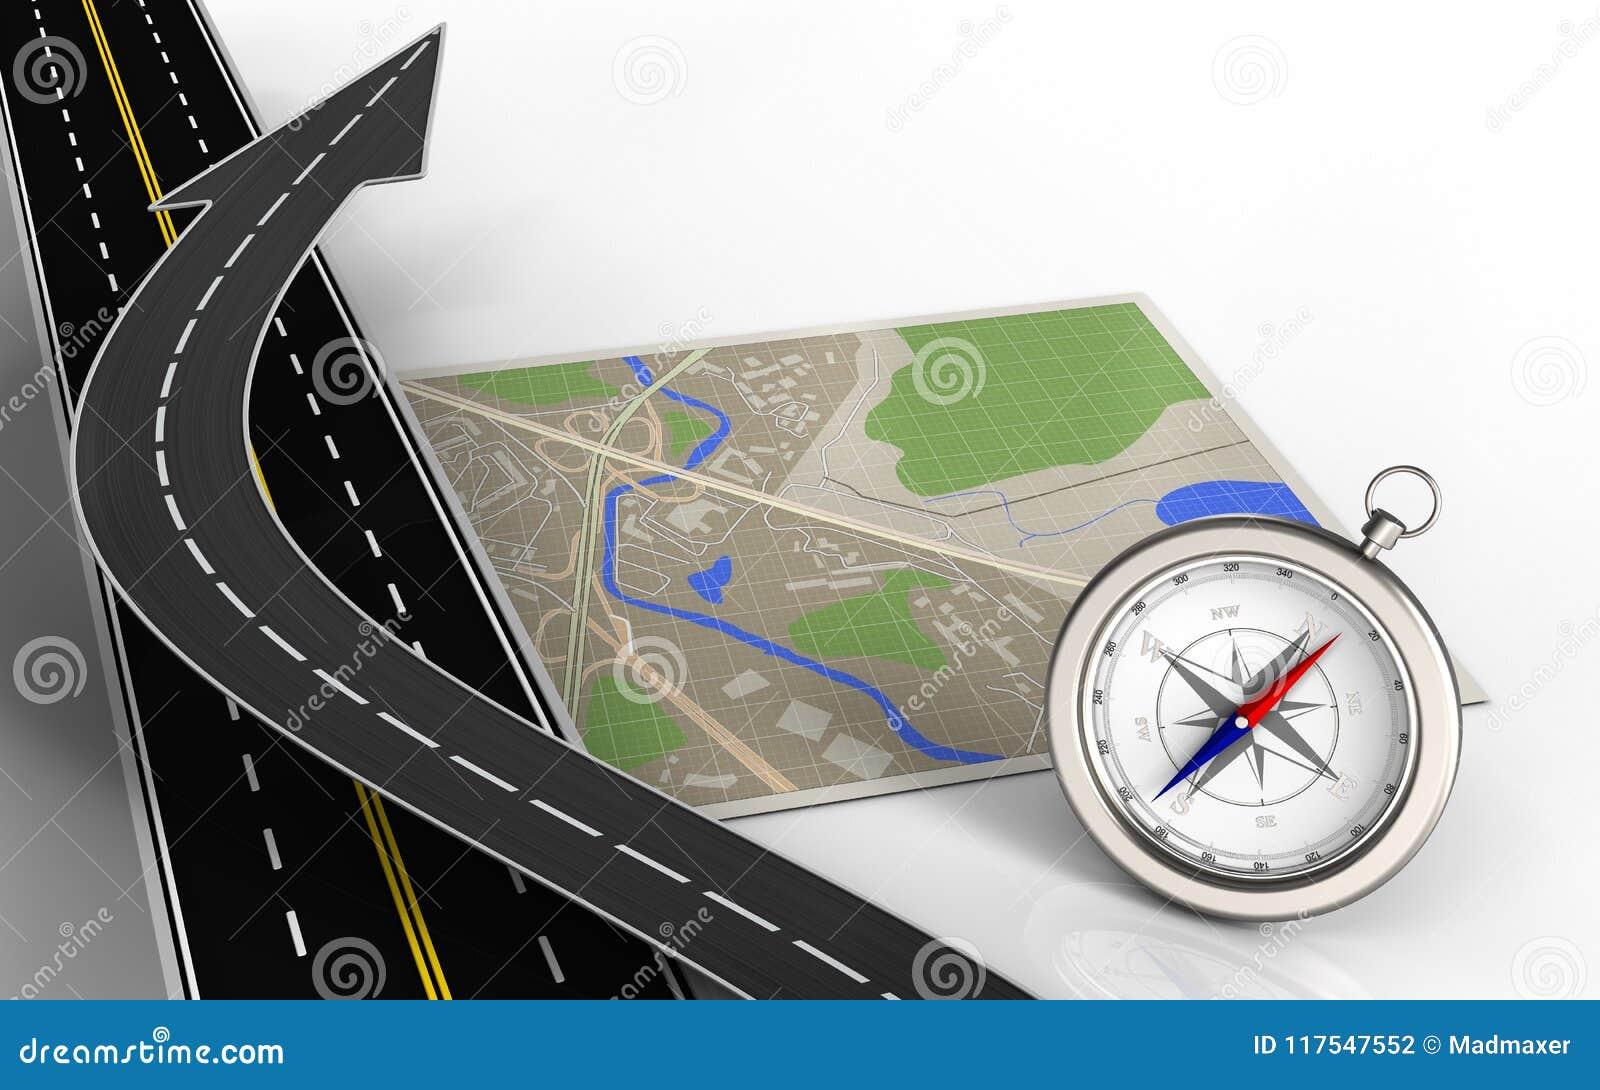 3d asphalt road stock illustration  Illustration of city - 117547552